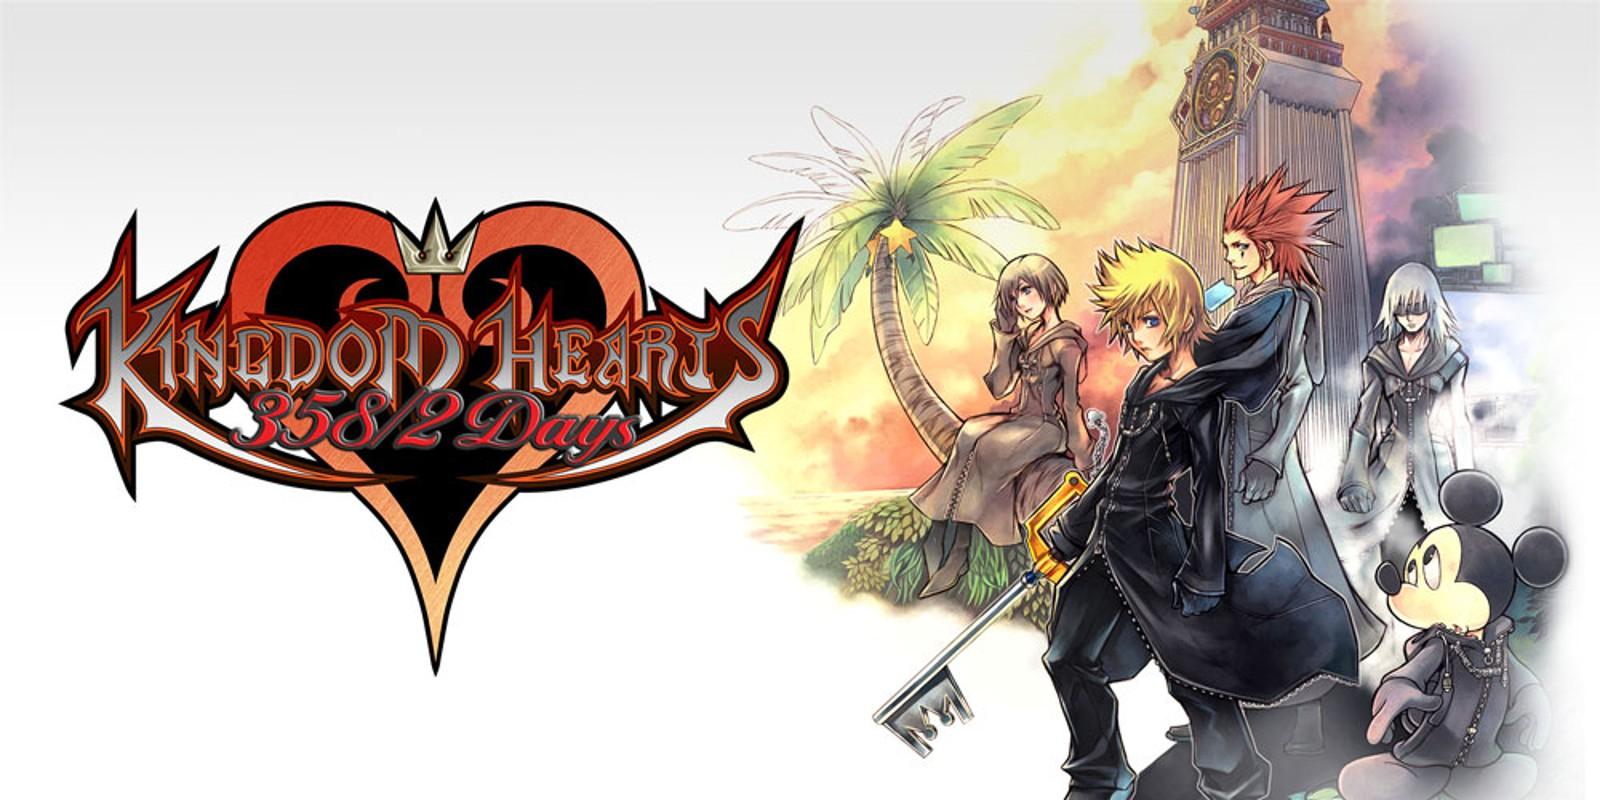 Zelda Hd Wallpaper Kingdom Hearts 358 2 Days Nintendo Ds Games Nintendo